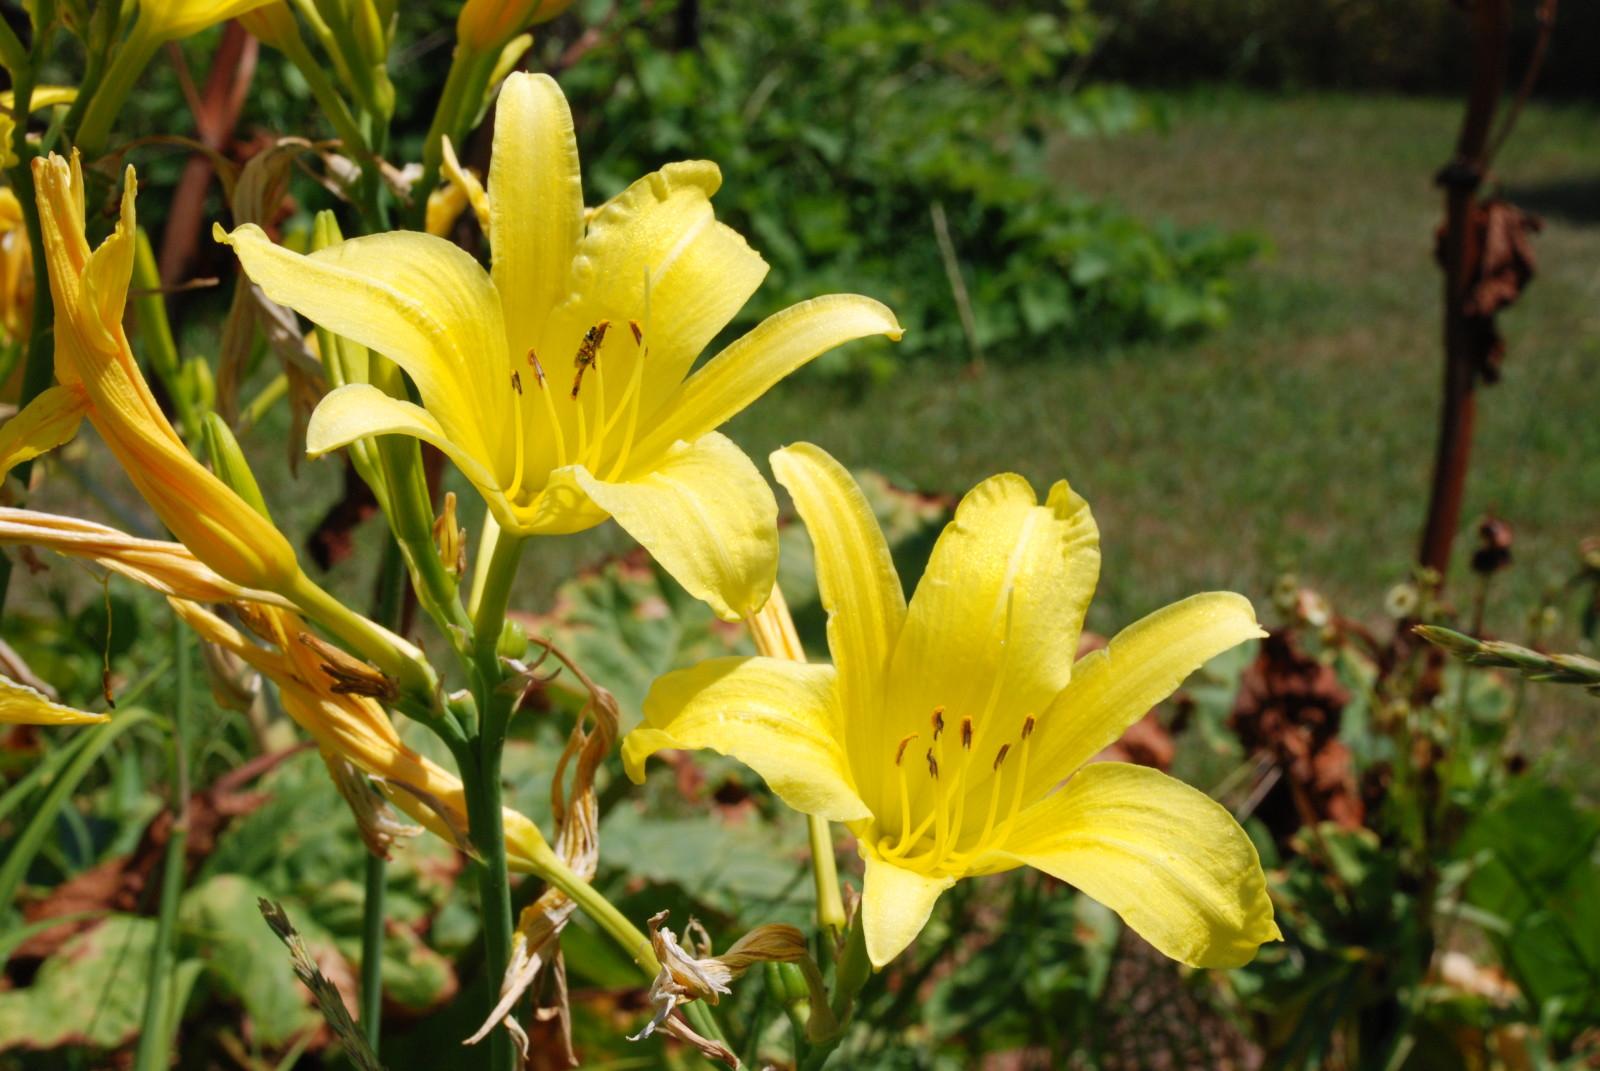 Consider the Lilies - original photograph